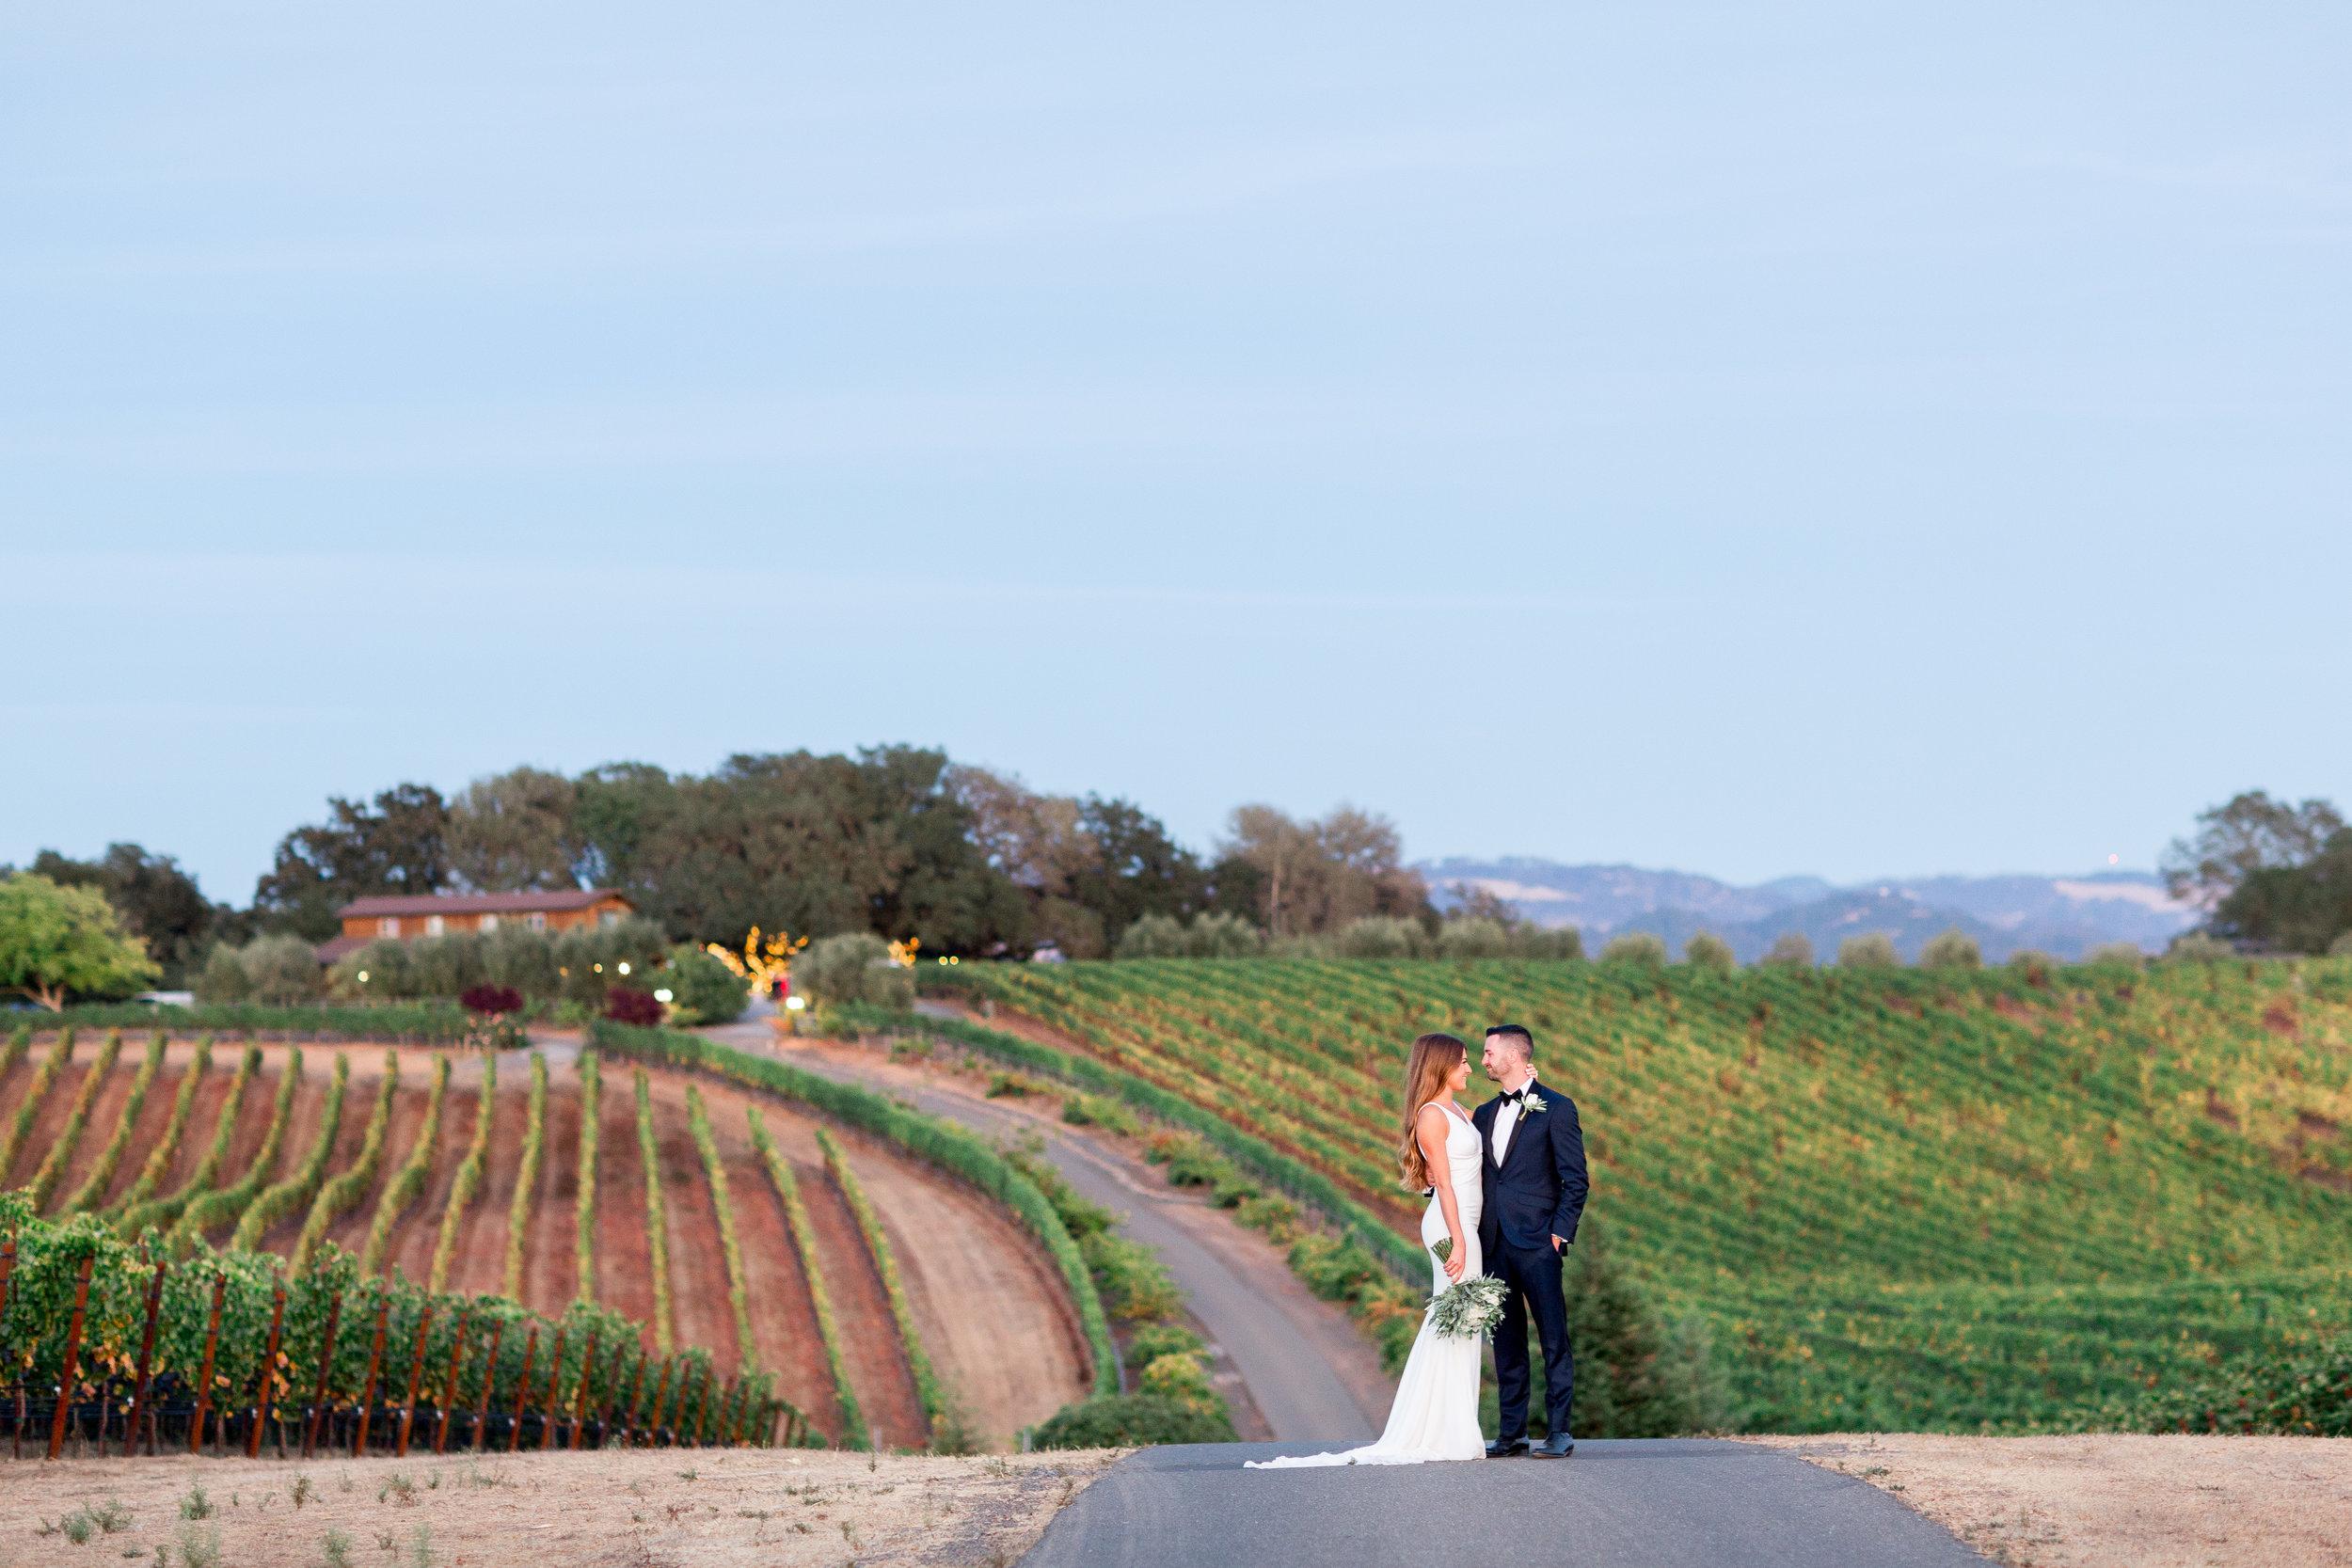 Calegari-Vineyards-Healdsburg-Wedding-Photographer (245 of 262).jpg